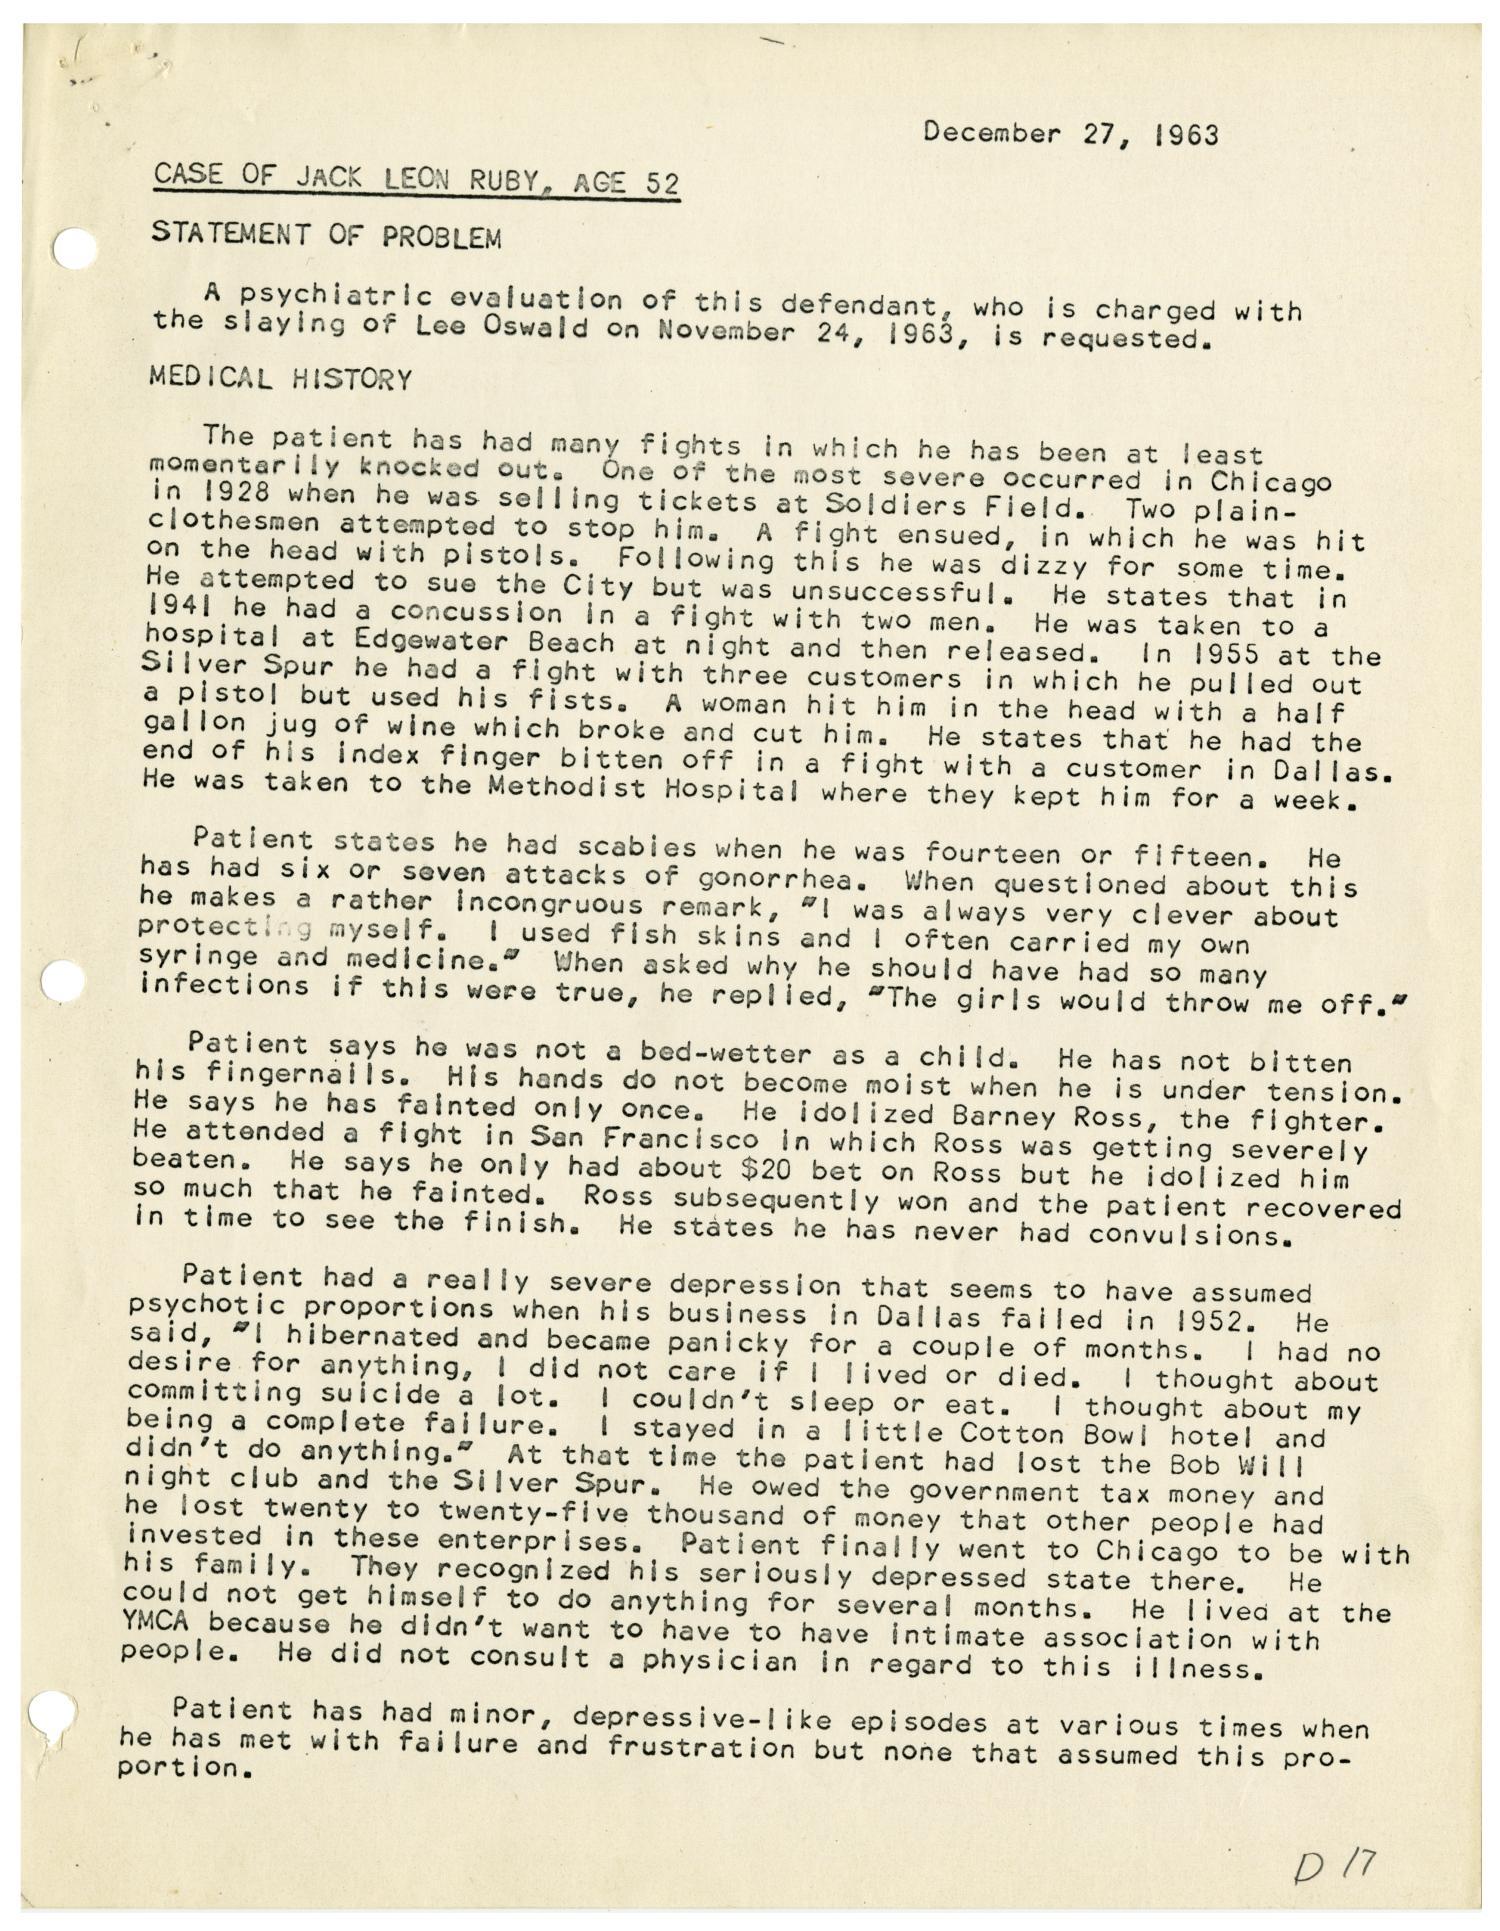 Psychiatric Evaluation of Jack Ruby - December 17, 1963